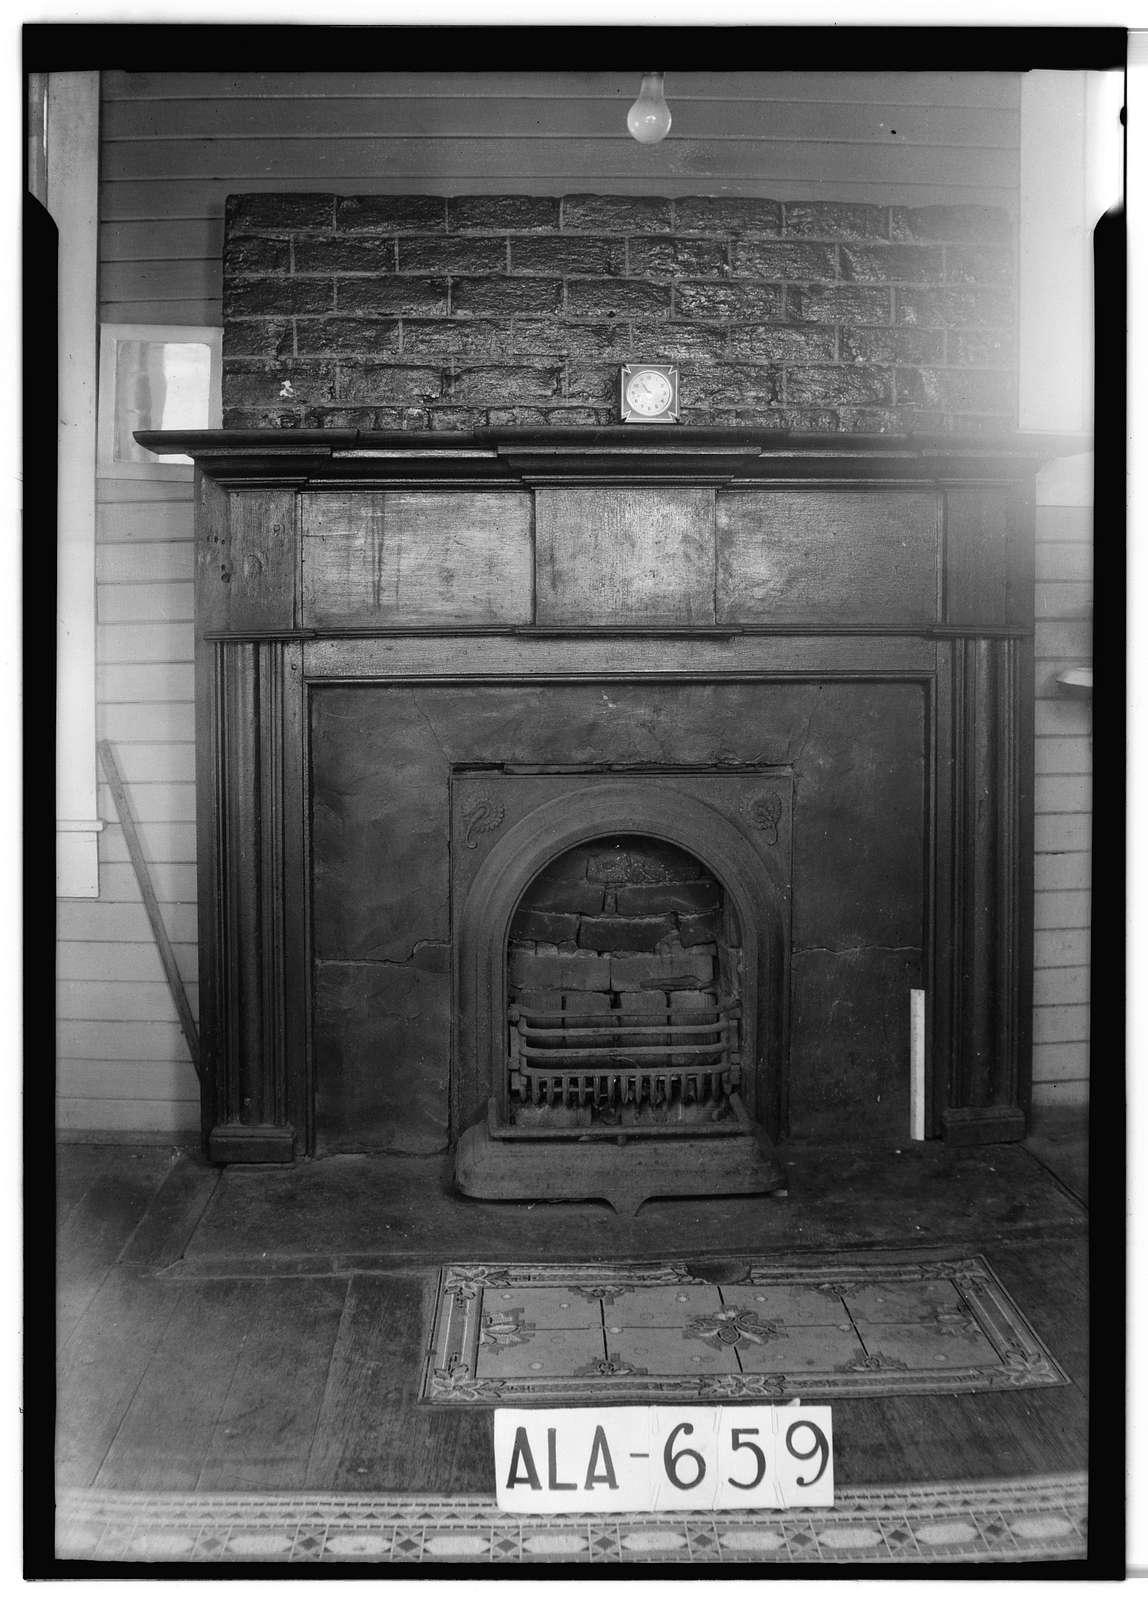 J. Bruce Airey House, 1202 West Tuskeena Street, Wetumpka, Elmore County, AL